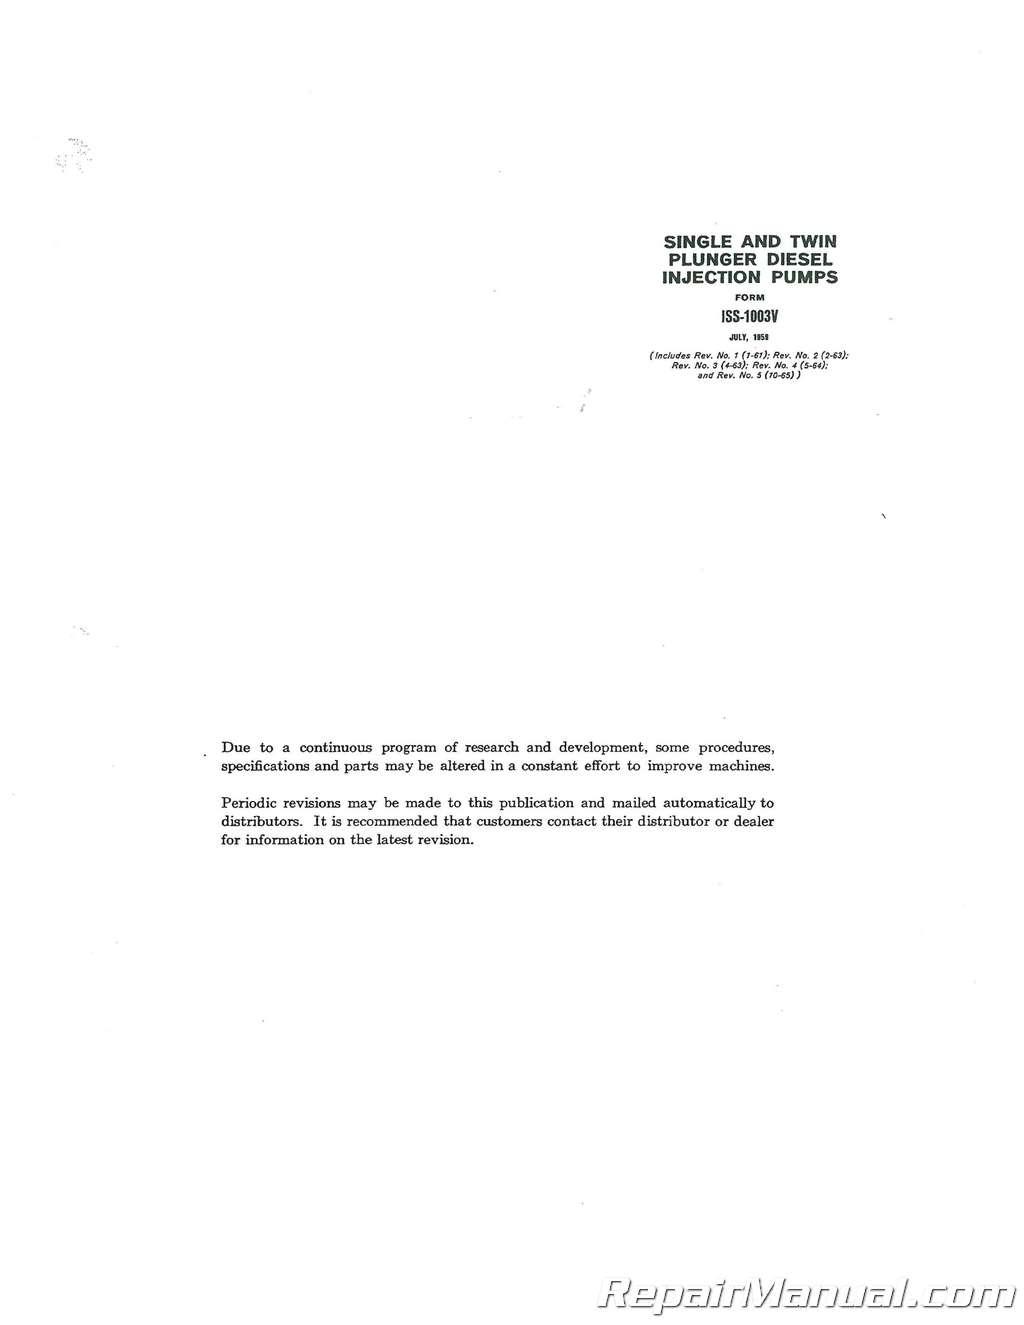 International Harvester TD-9 Crawler Diesel Pump Bosch Service Manual